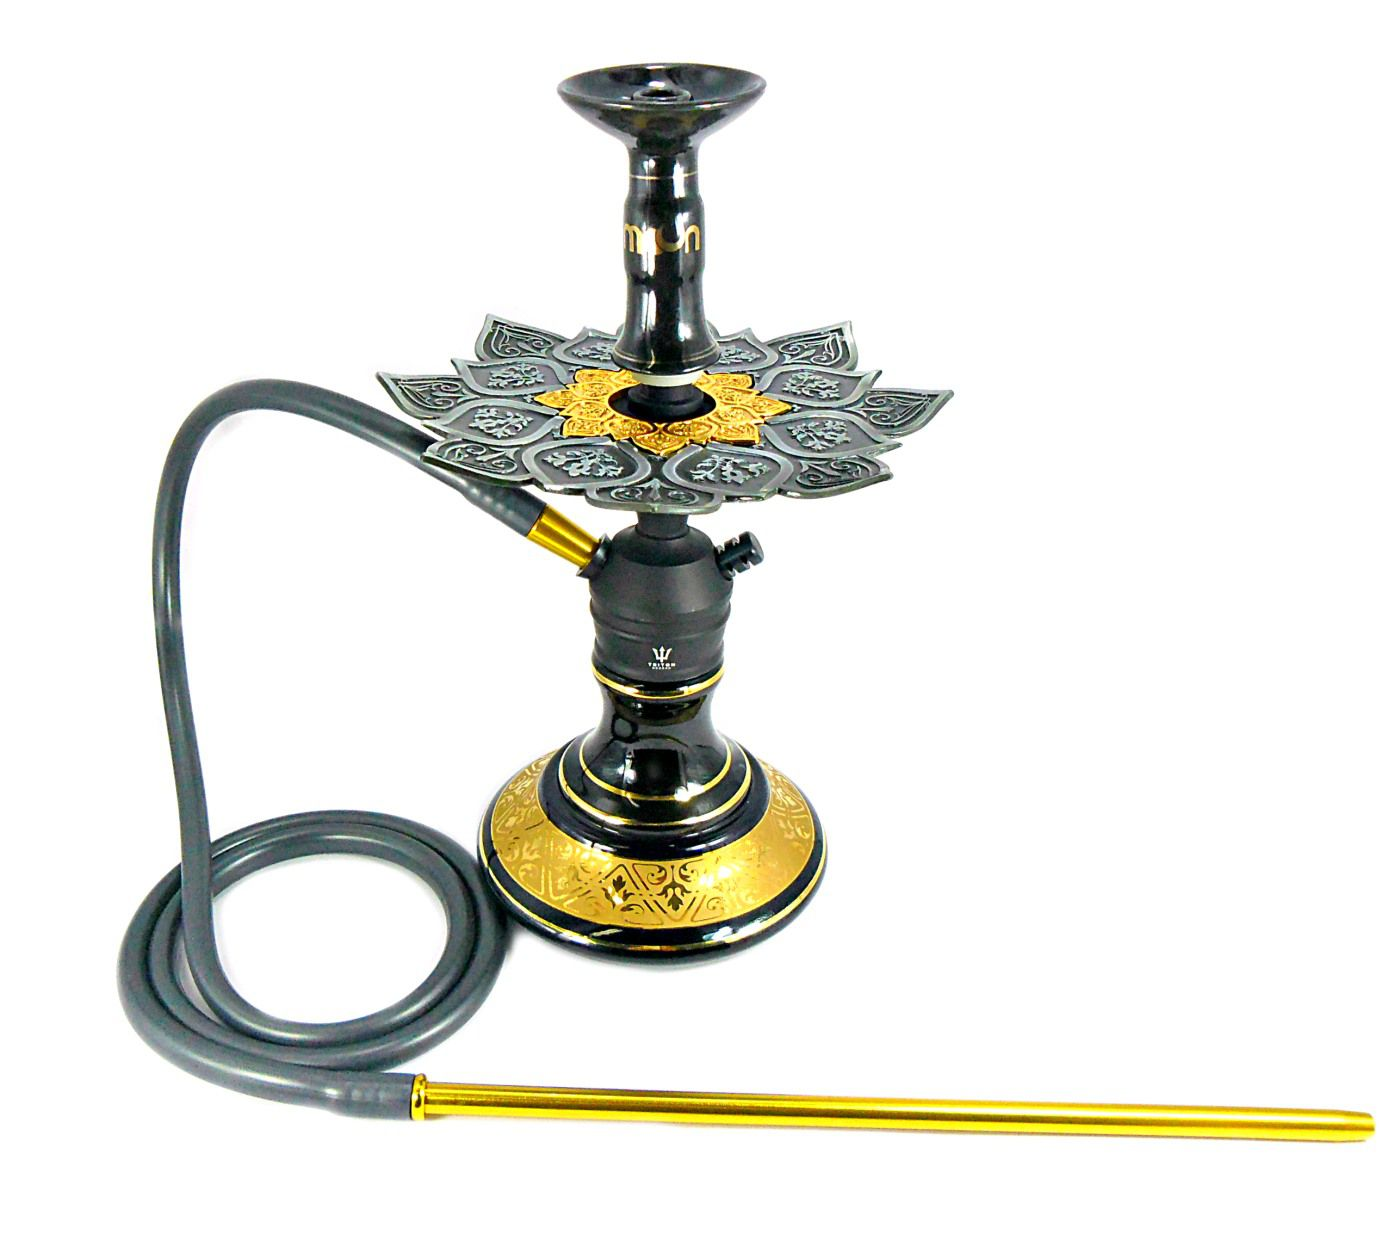 Narguile Triton Zip Preto, vaso Aladin, mang. silic., pit.alumínio,rosh listra dour., prato Athenas